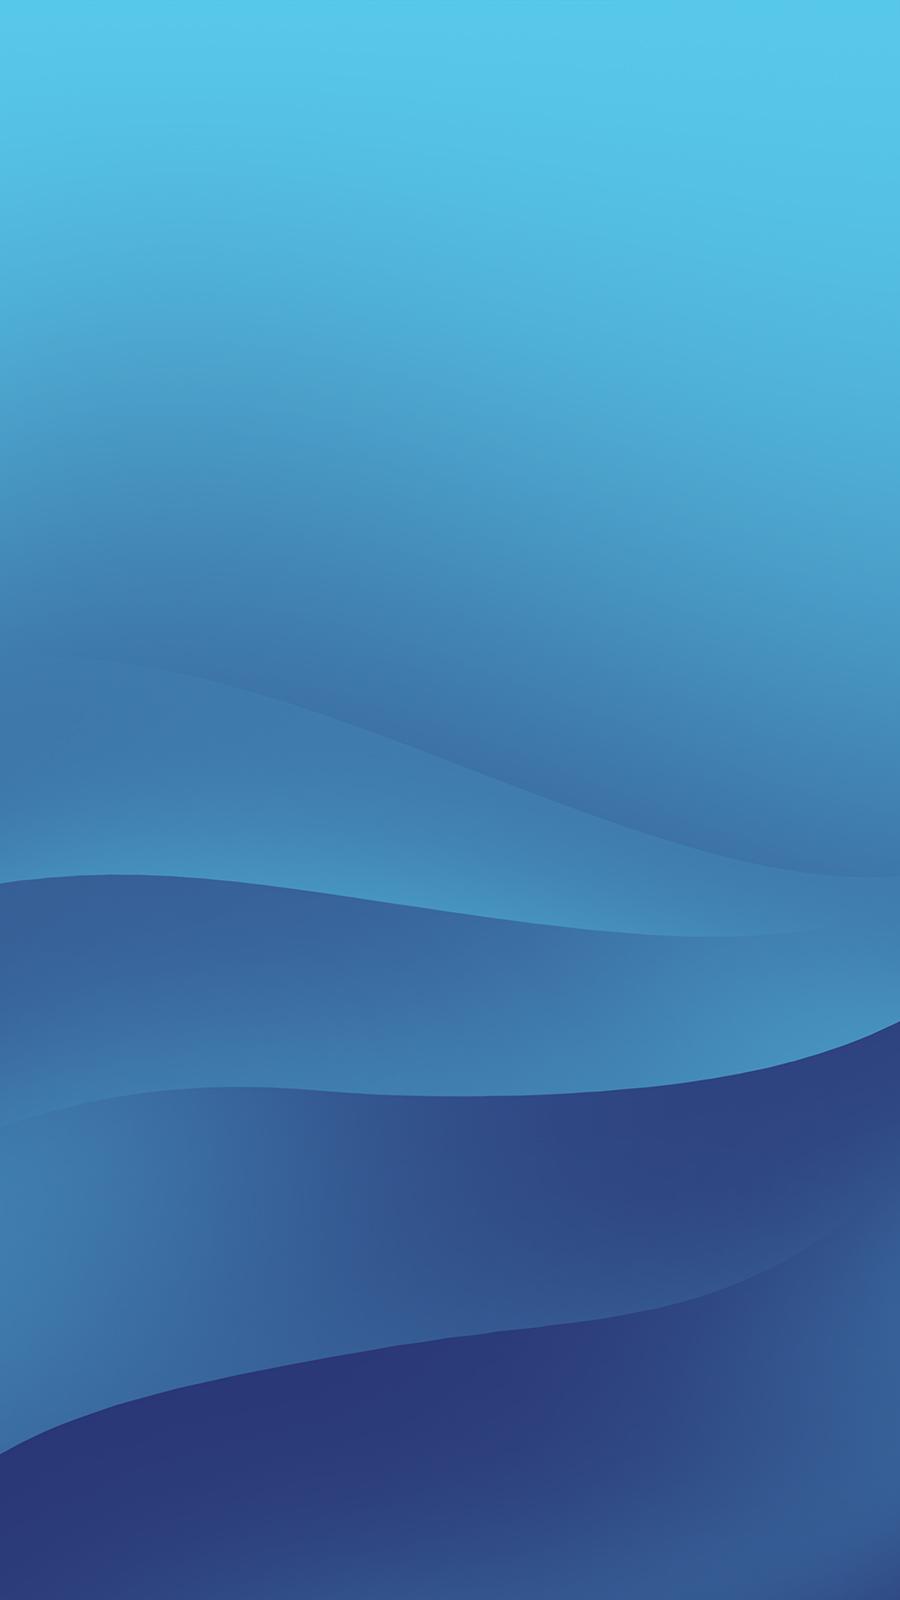 Samsung Galaxy Tab A Series Wallpapers – Samsung Wallpaper